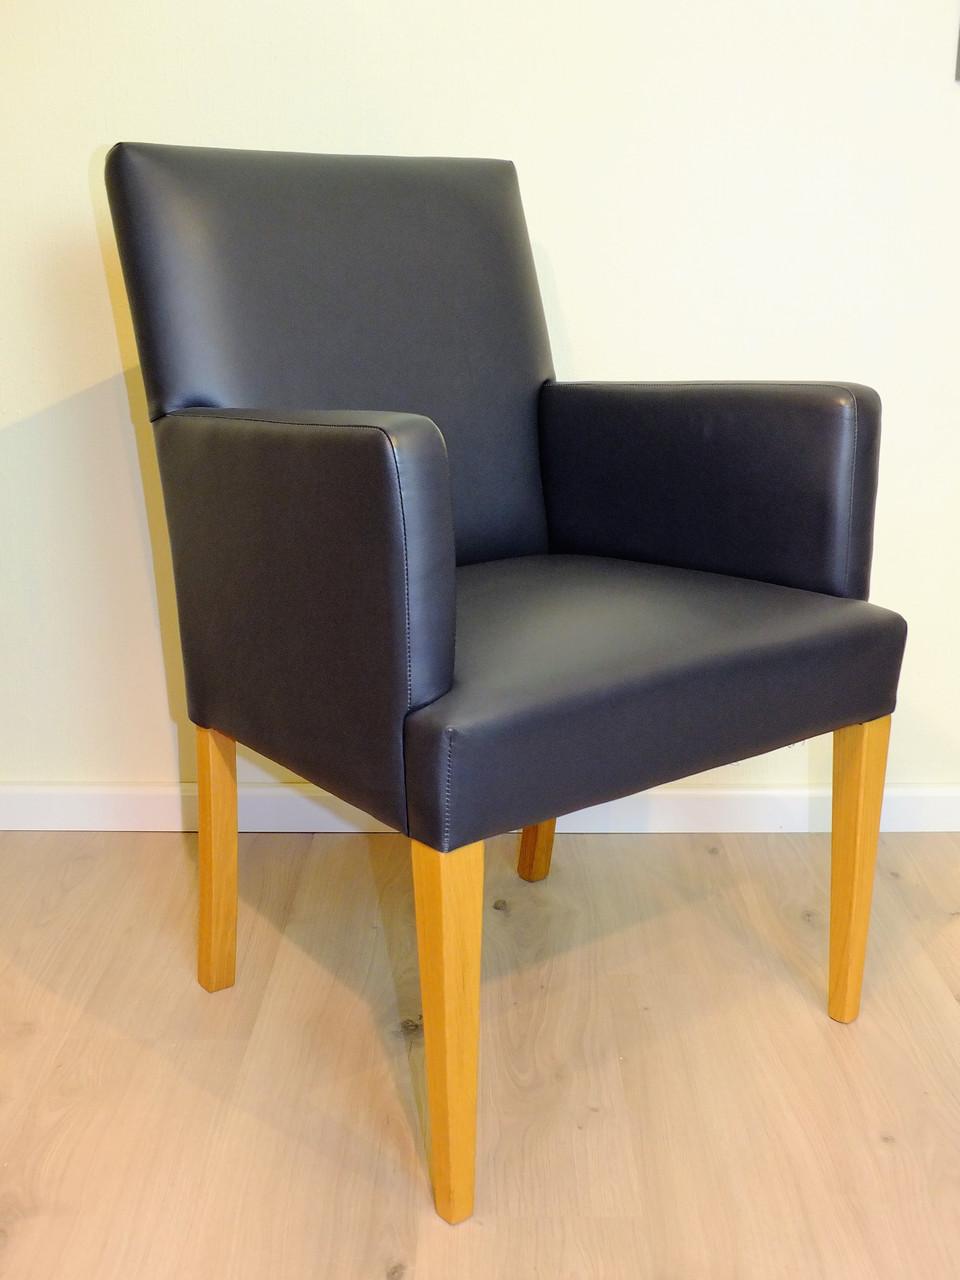 sessel rastatt eiche massiv leder grau ausstellungsst ck zum sonderpreis 995 00 angebote. Black Bedroom Furniture Sets. Home Design Ideas